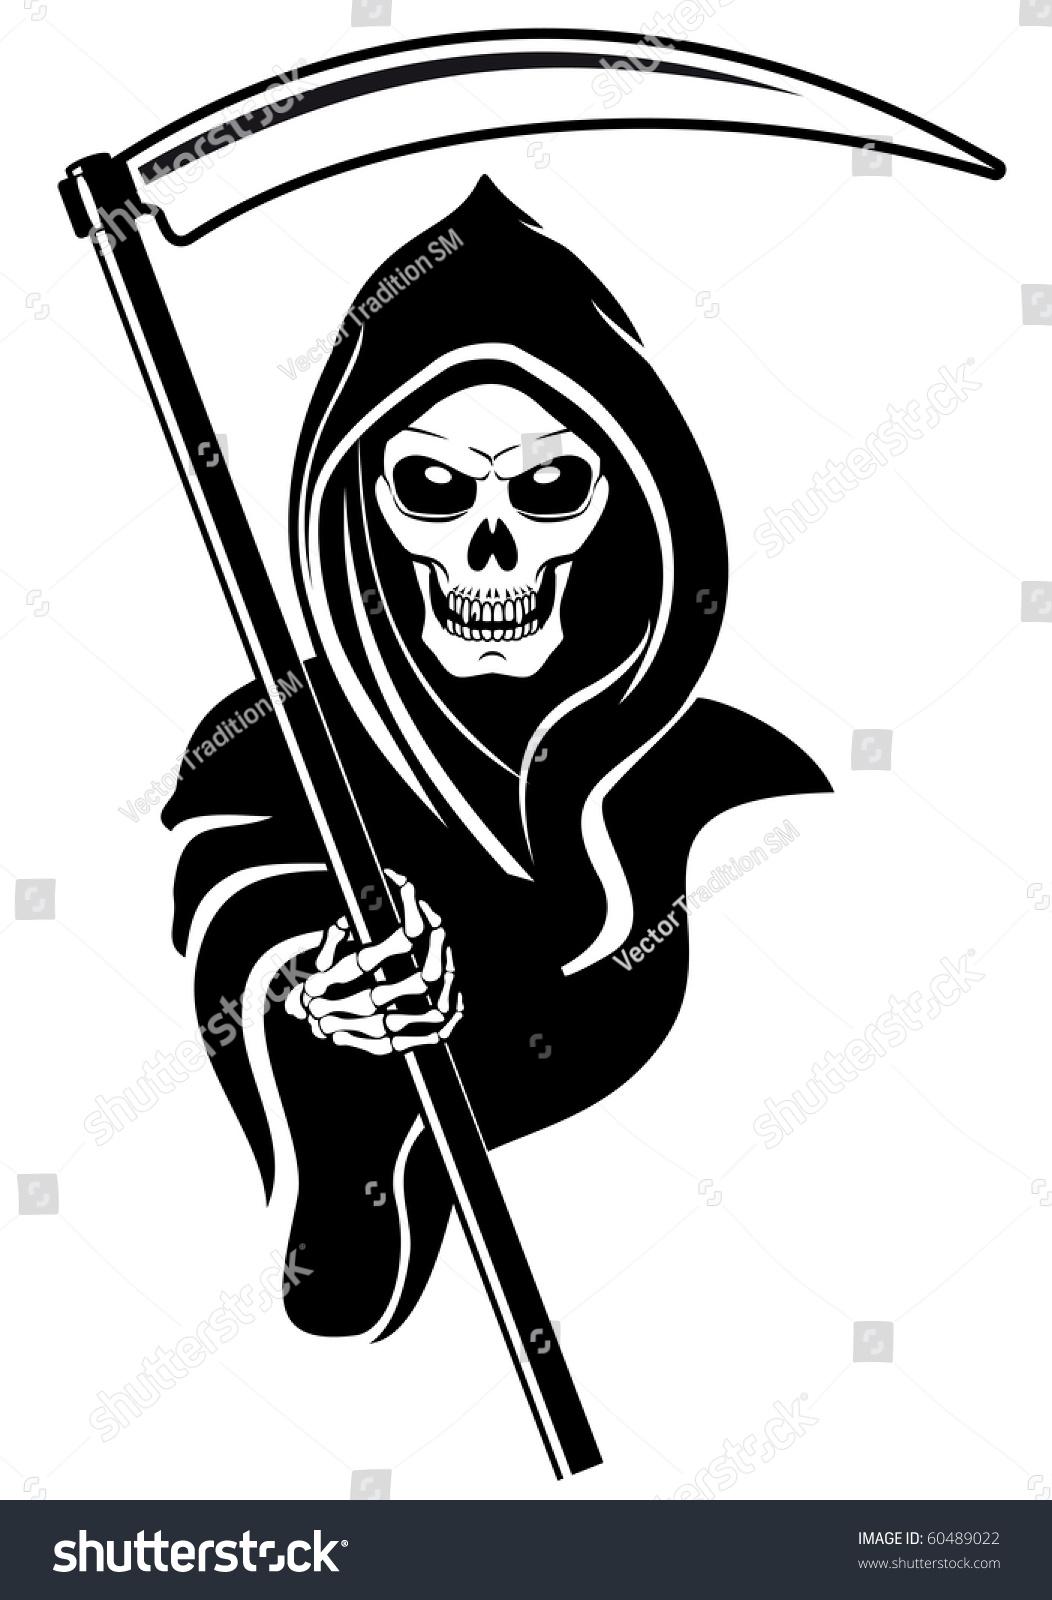 Death Sign Isolated On White Tattoo Stock Illustration